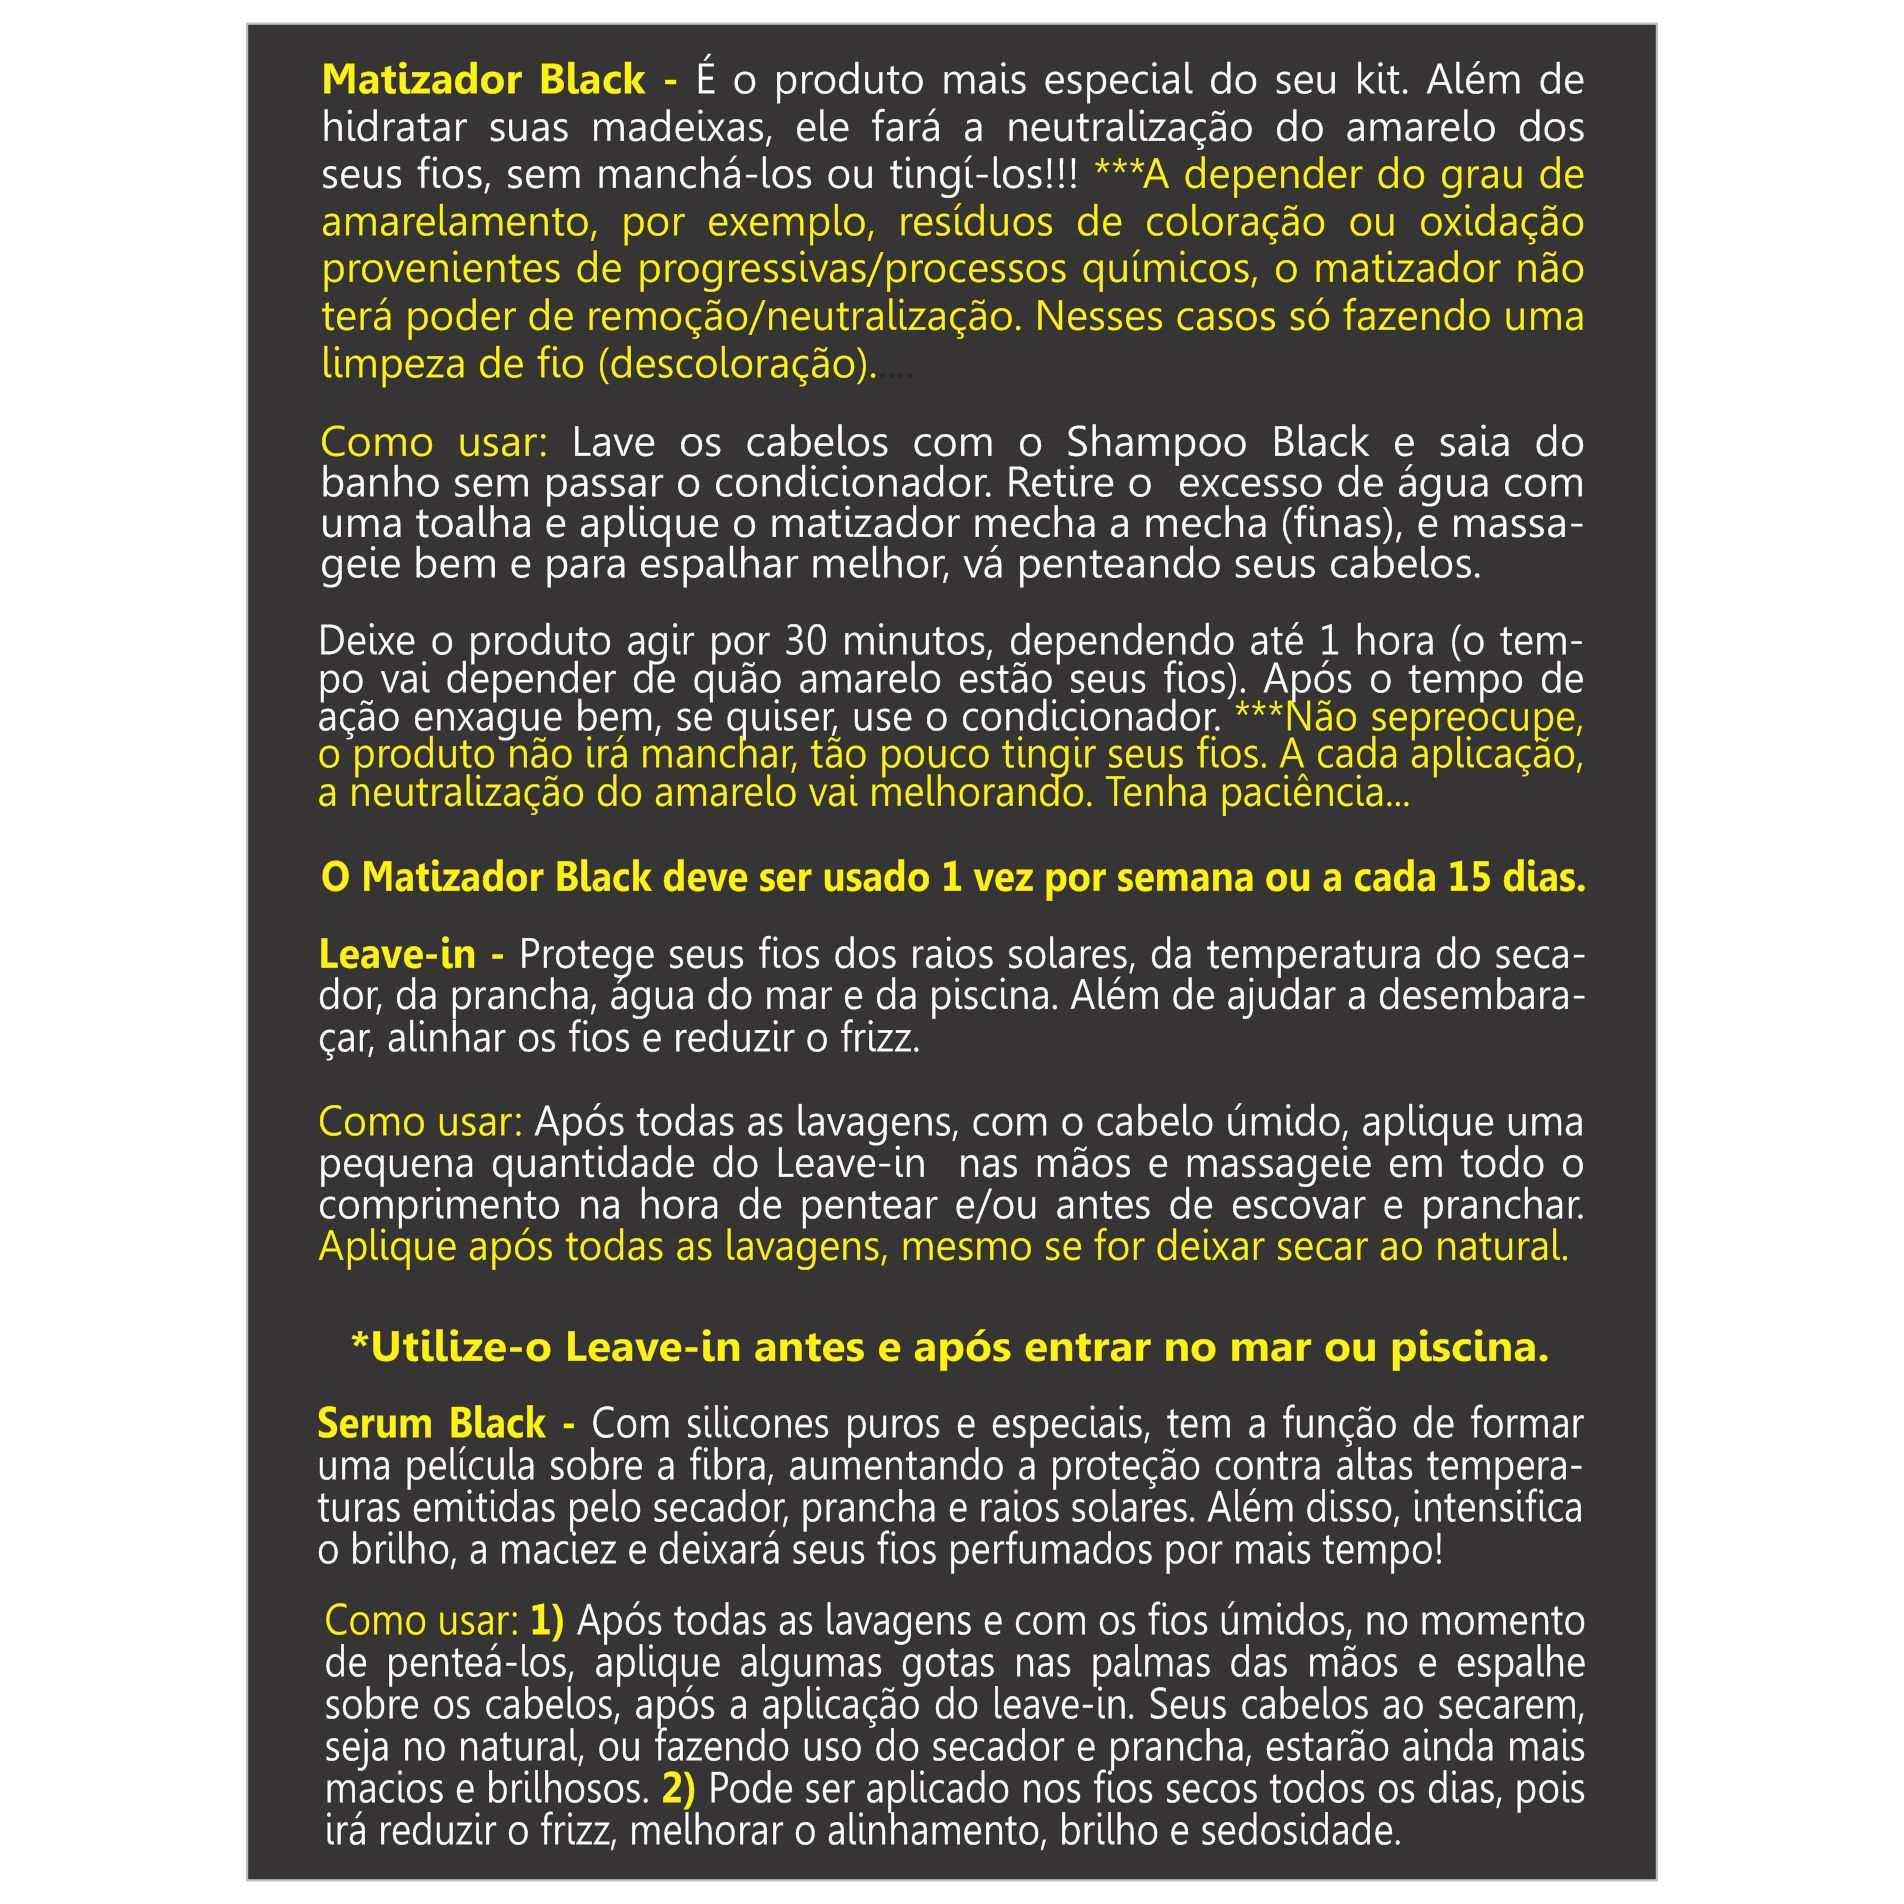 Leave-in/Protetor Termico Desamarelador Black 250g - Cabelos Brancos e Grisalhos